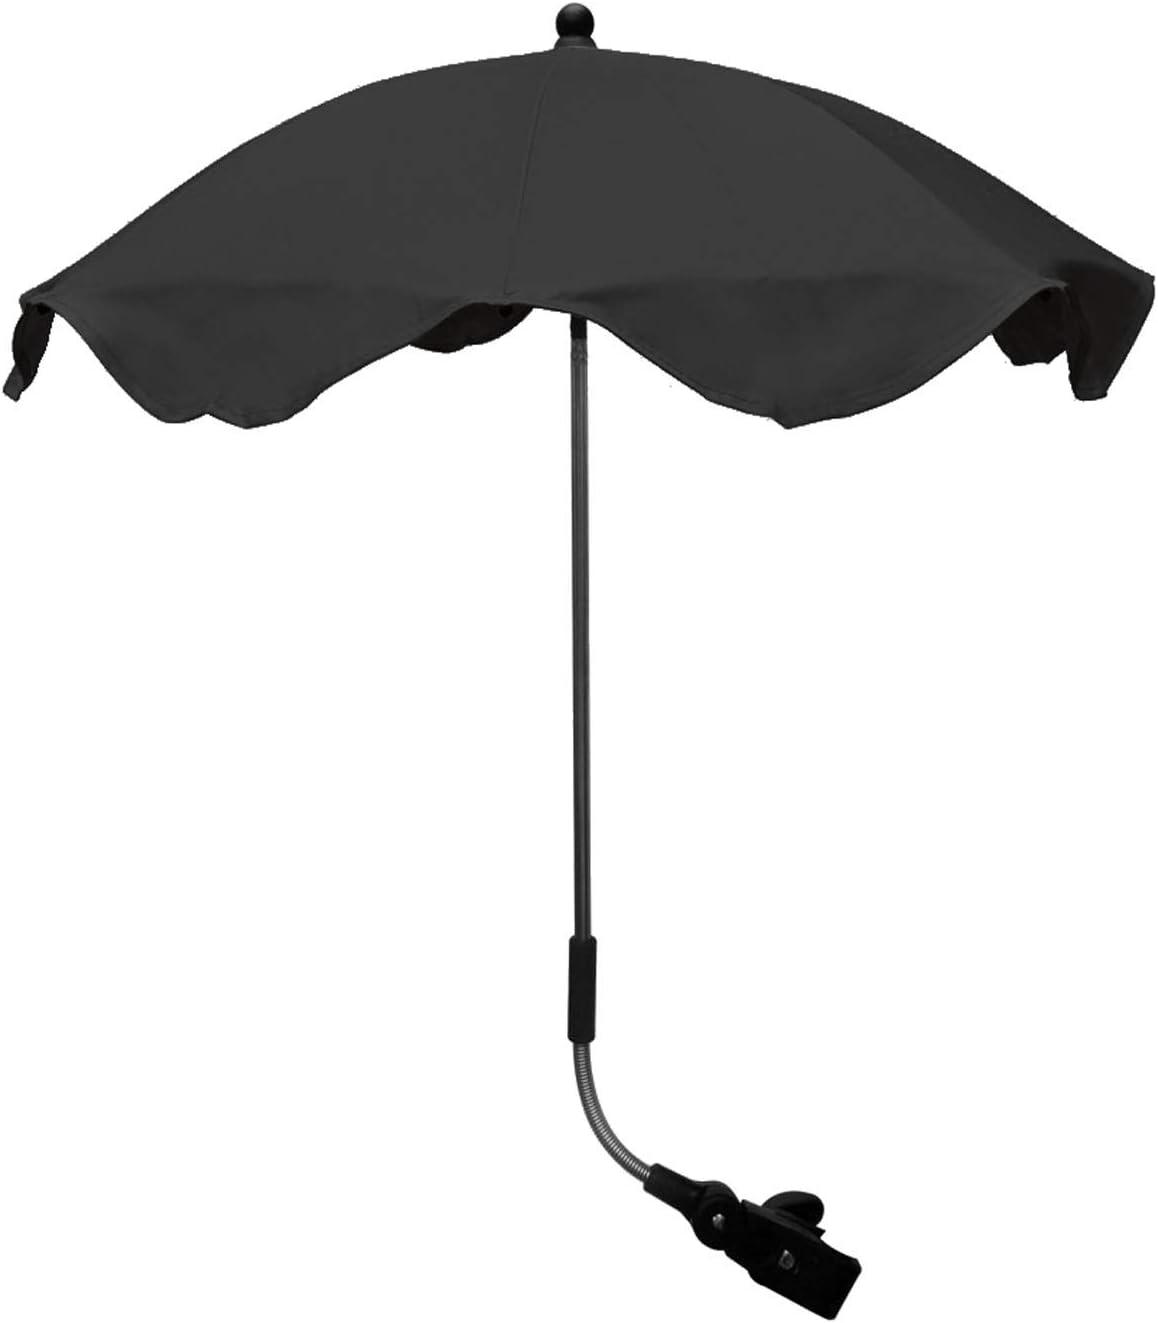 Universal Stroller Pram Parasol Umbrella Canopy Triple Adjust Fully Universal (Black) (to Fit  sc 1 st  Amazon UK & Baby: Parasols u0026 Sun Covers